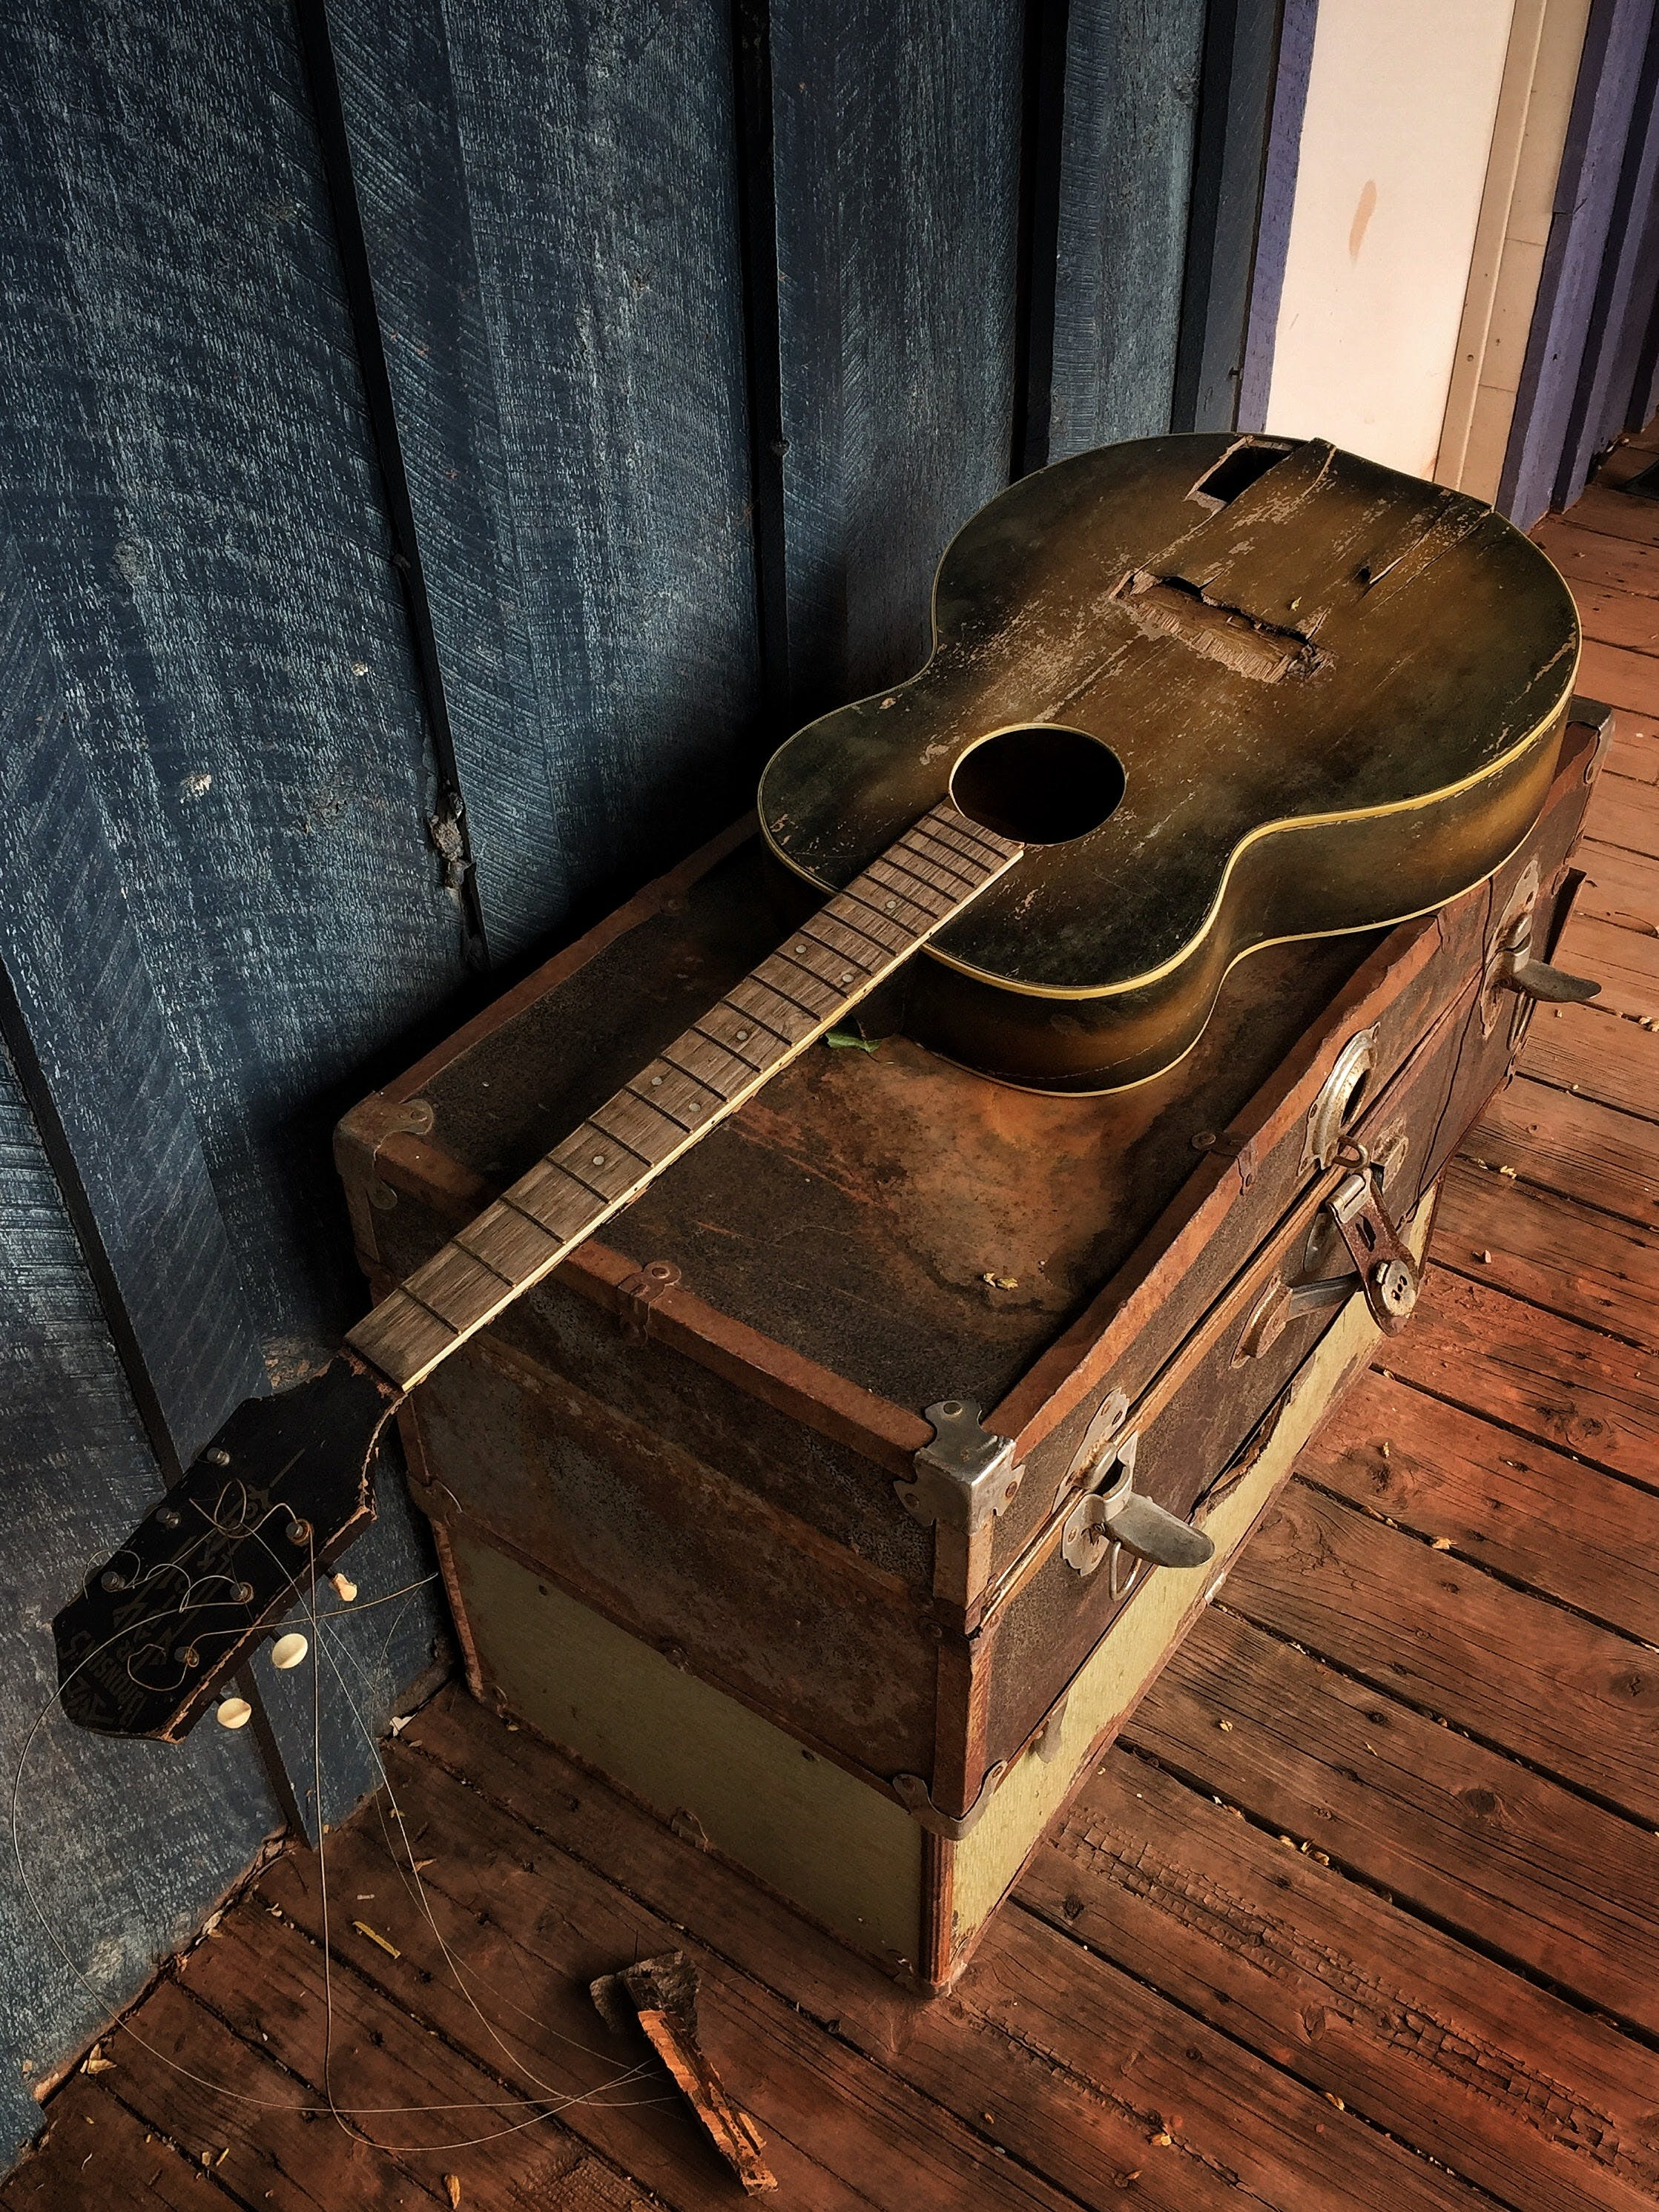 Kostenloses Stock Foto zu blau, fall, geist, gitarre